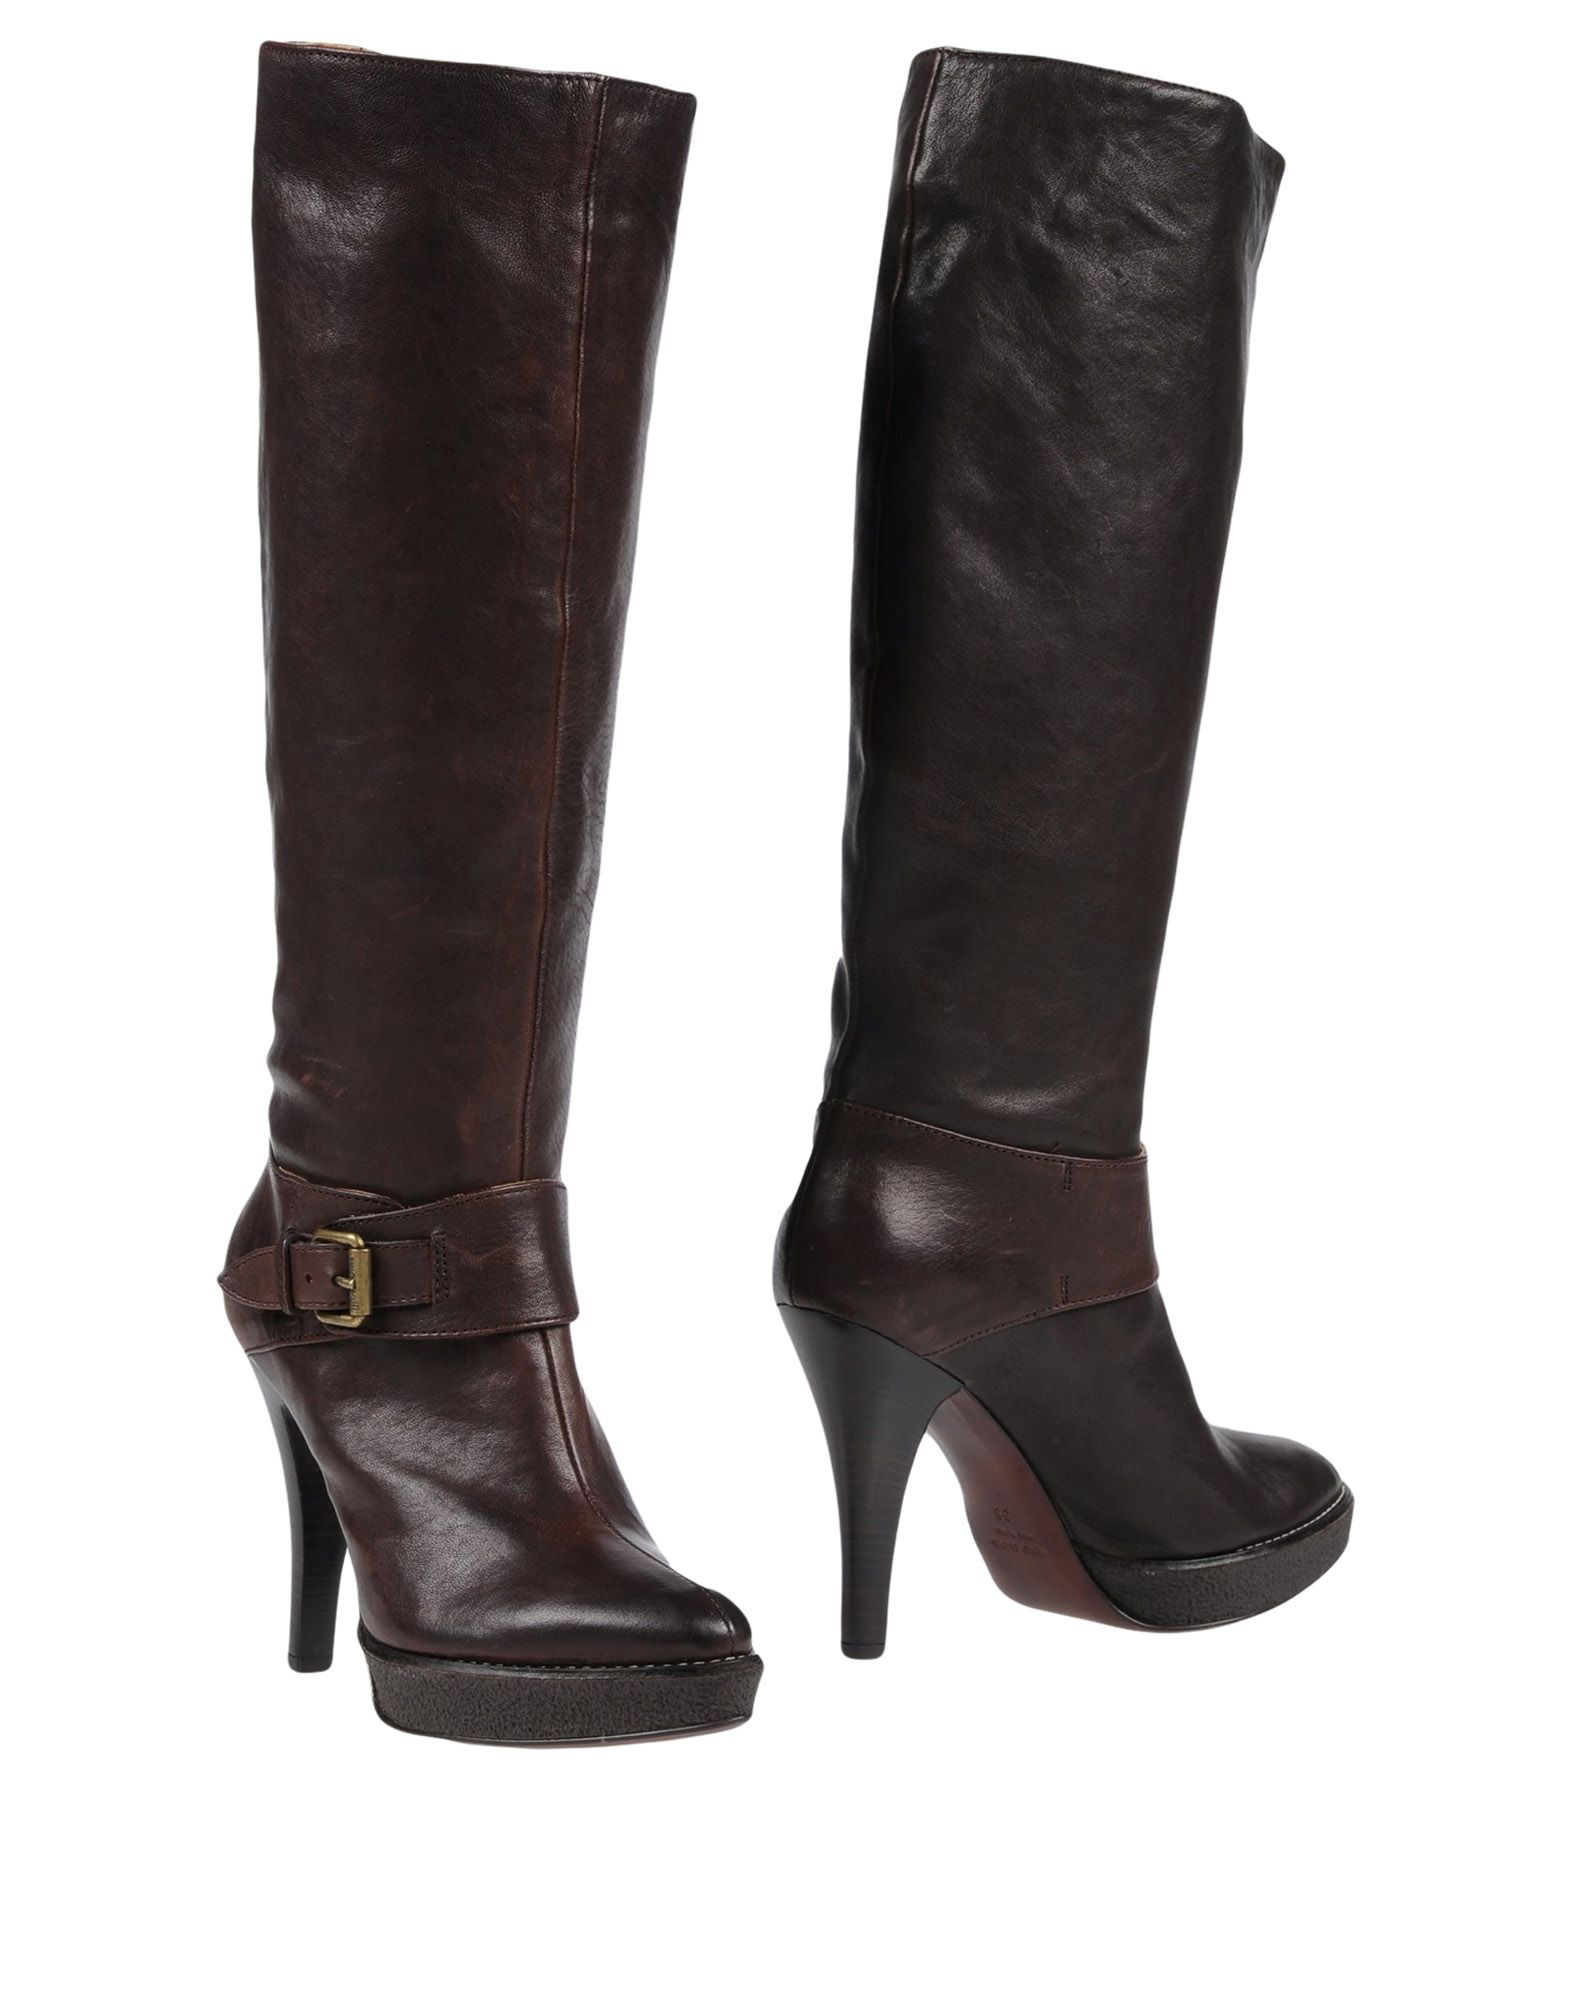 Stivali Just Cavalli Donna - Acquista online su